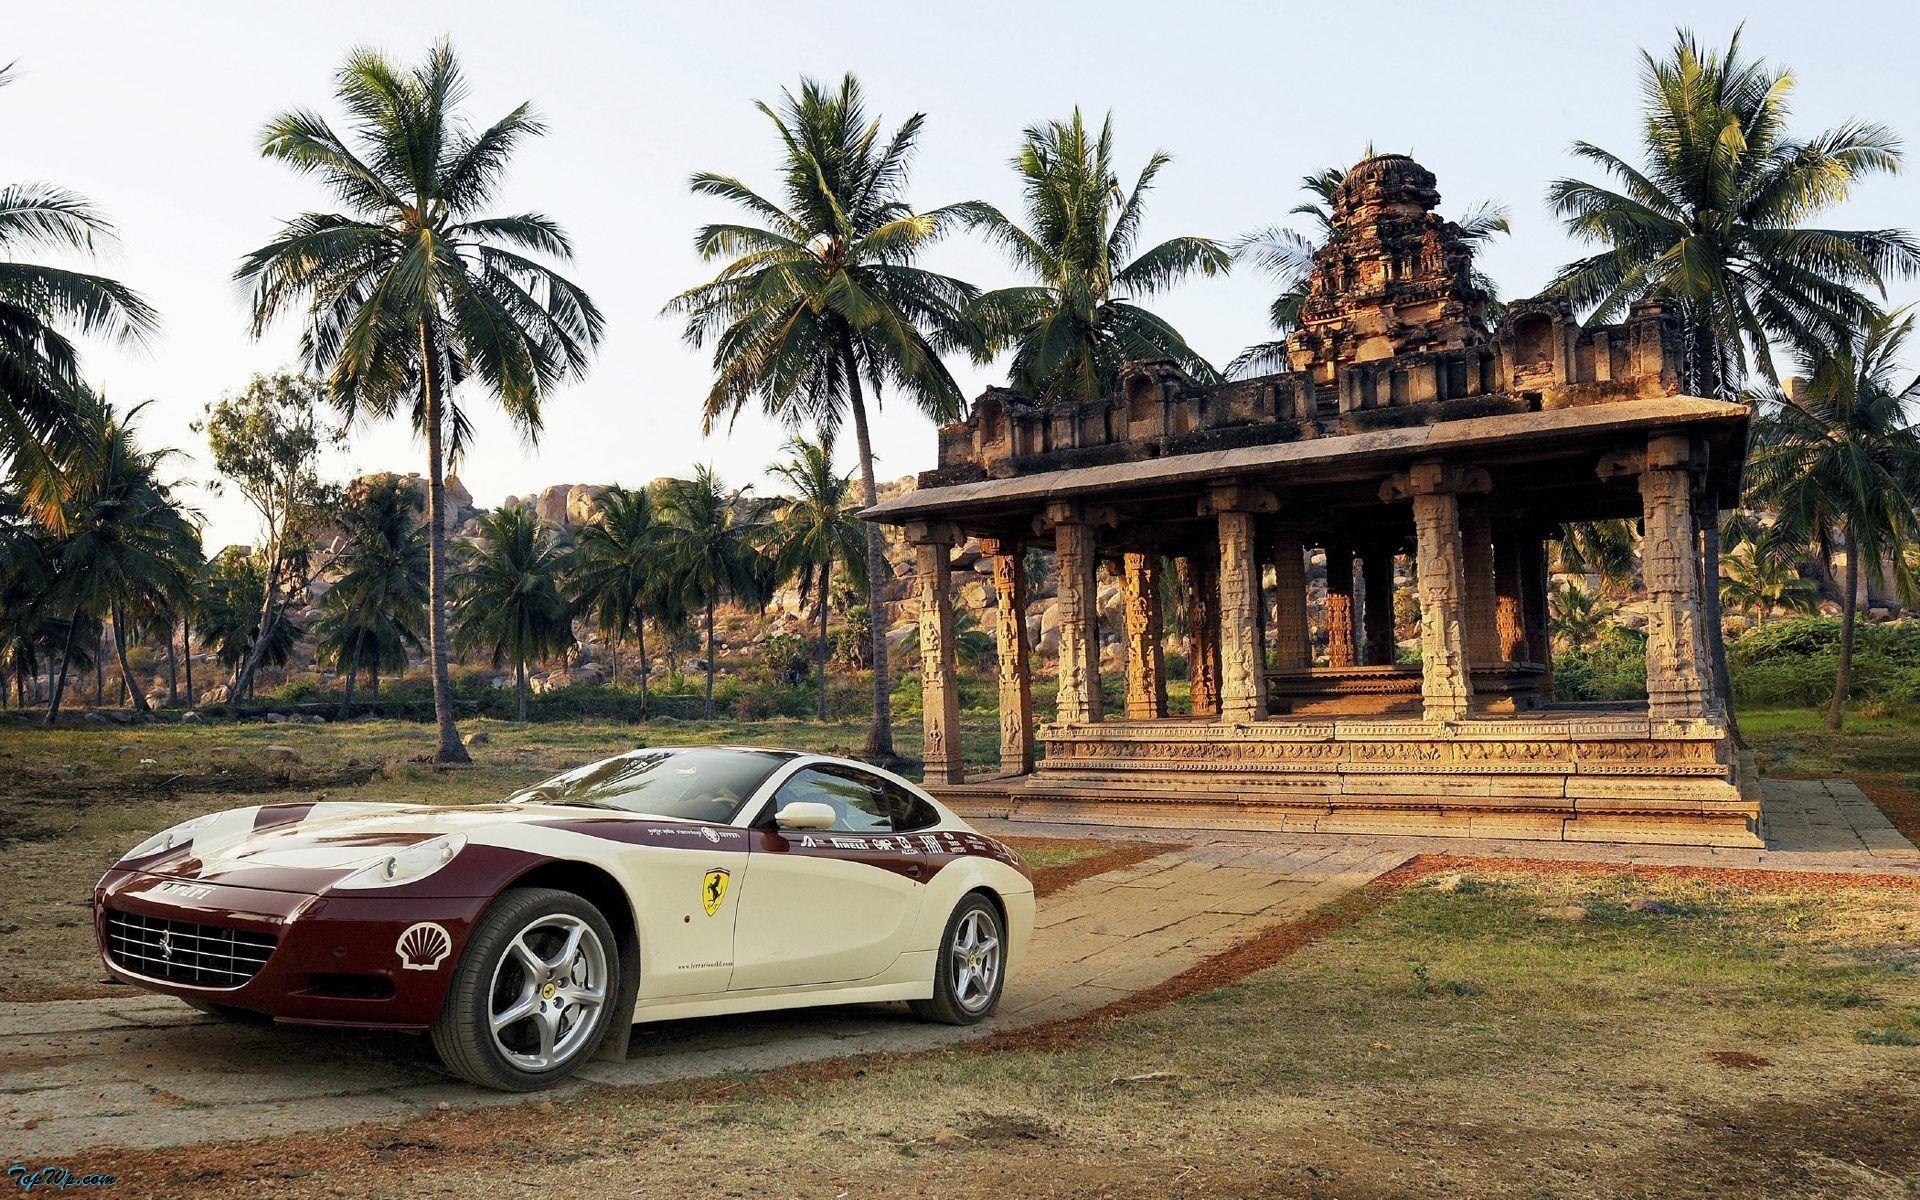 Ferrari Indian Temple Cars Hd Wallpapers Pinterest Ferrari